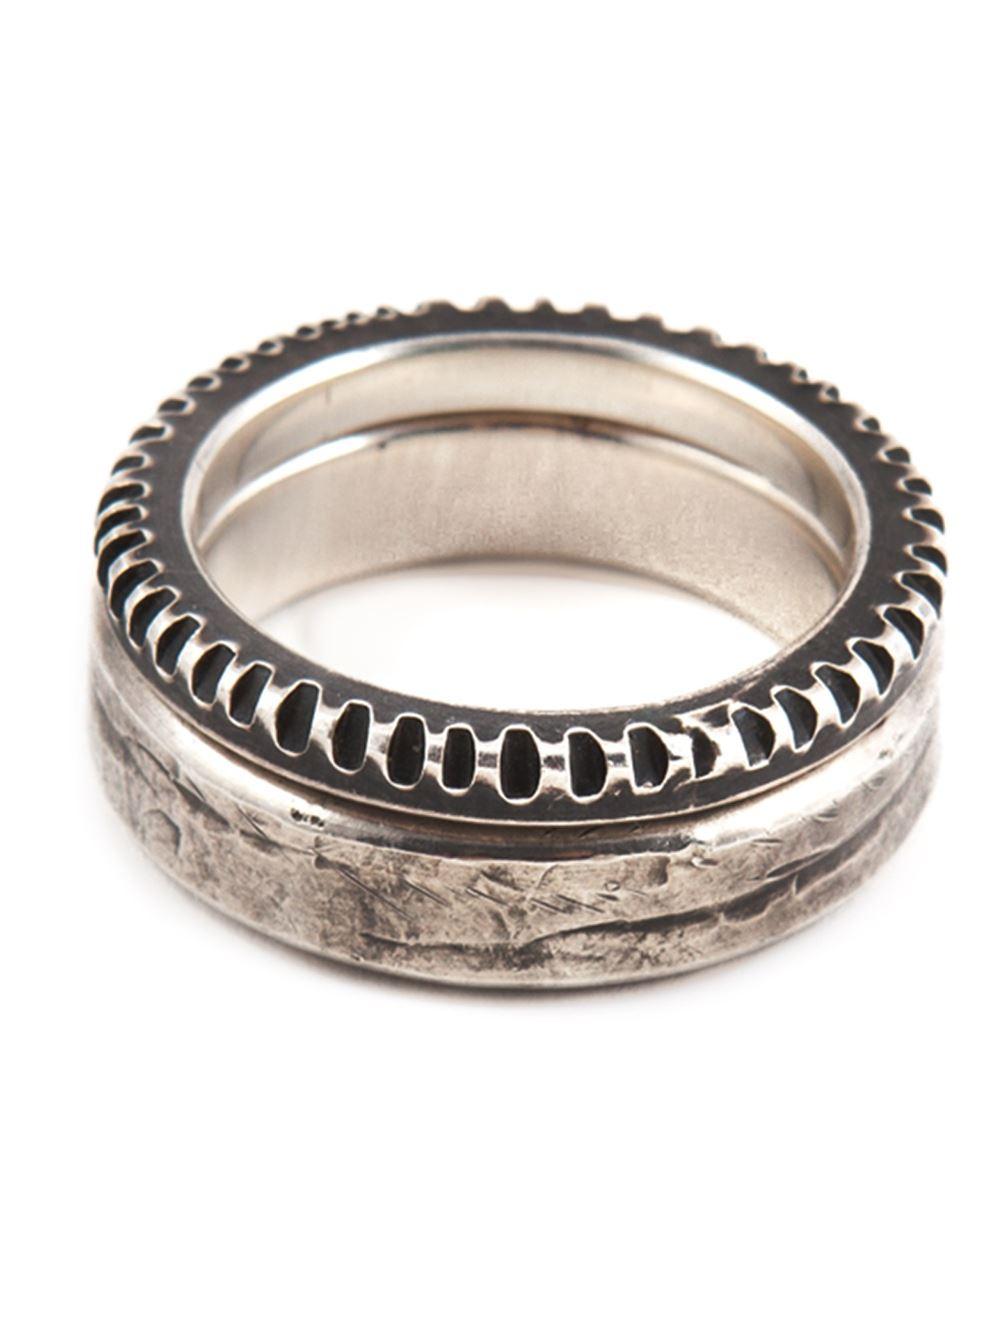 embossed ring set - Metallic Werkstatt M V4L9CrEbQB